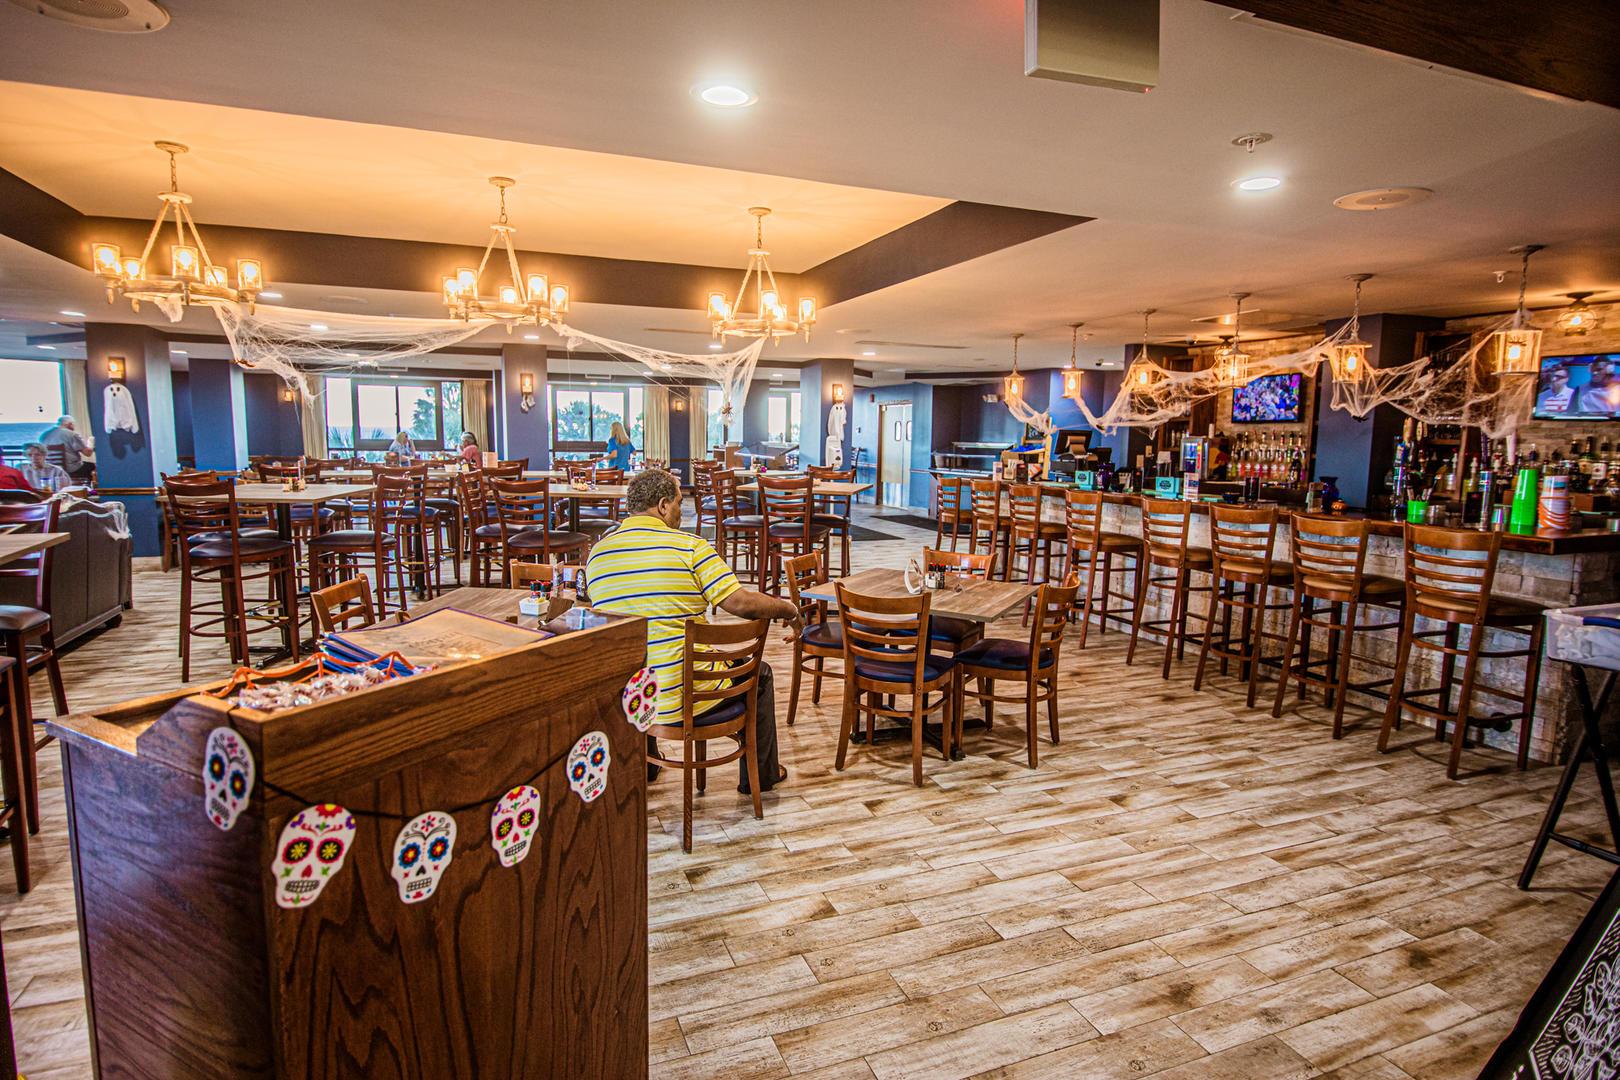 Patricia Grand Restaurant